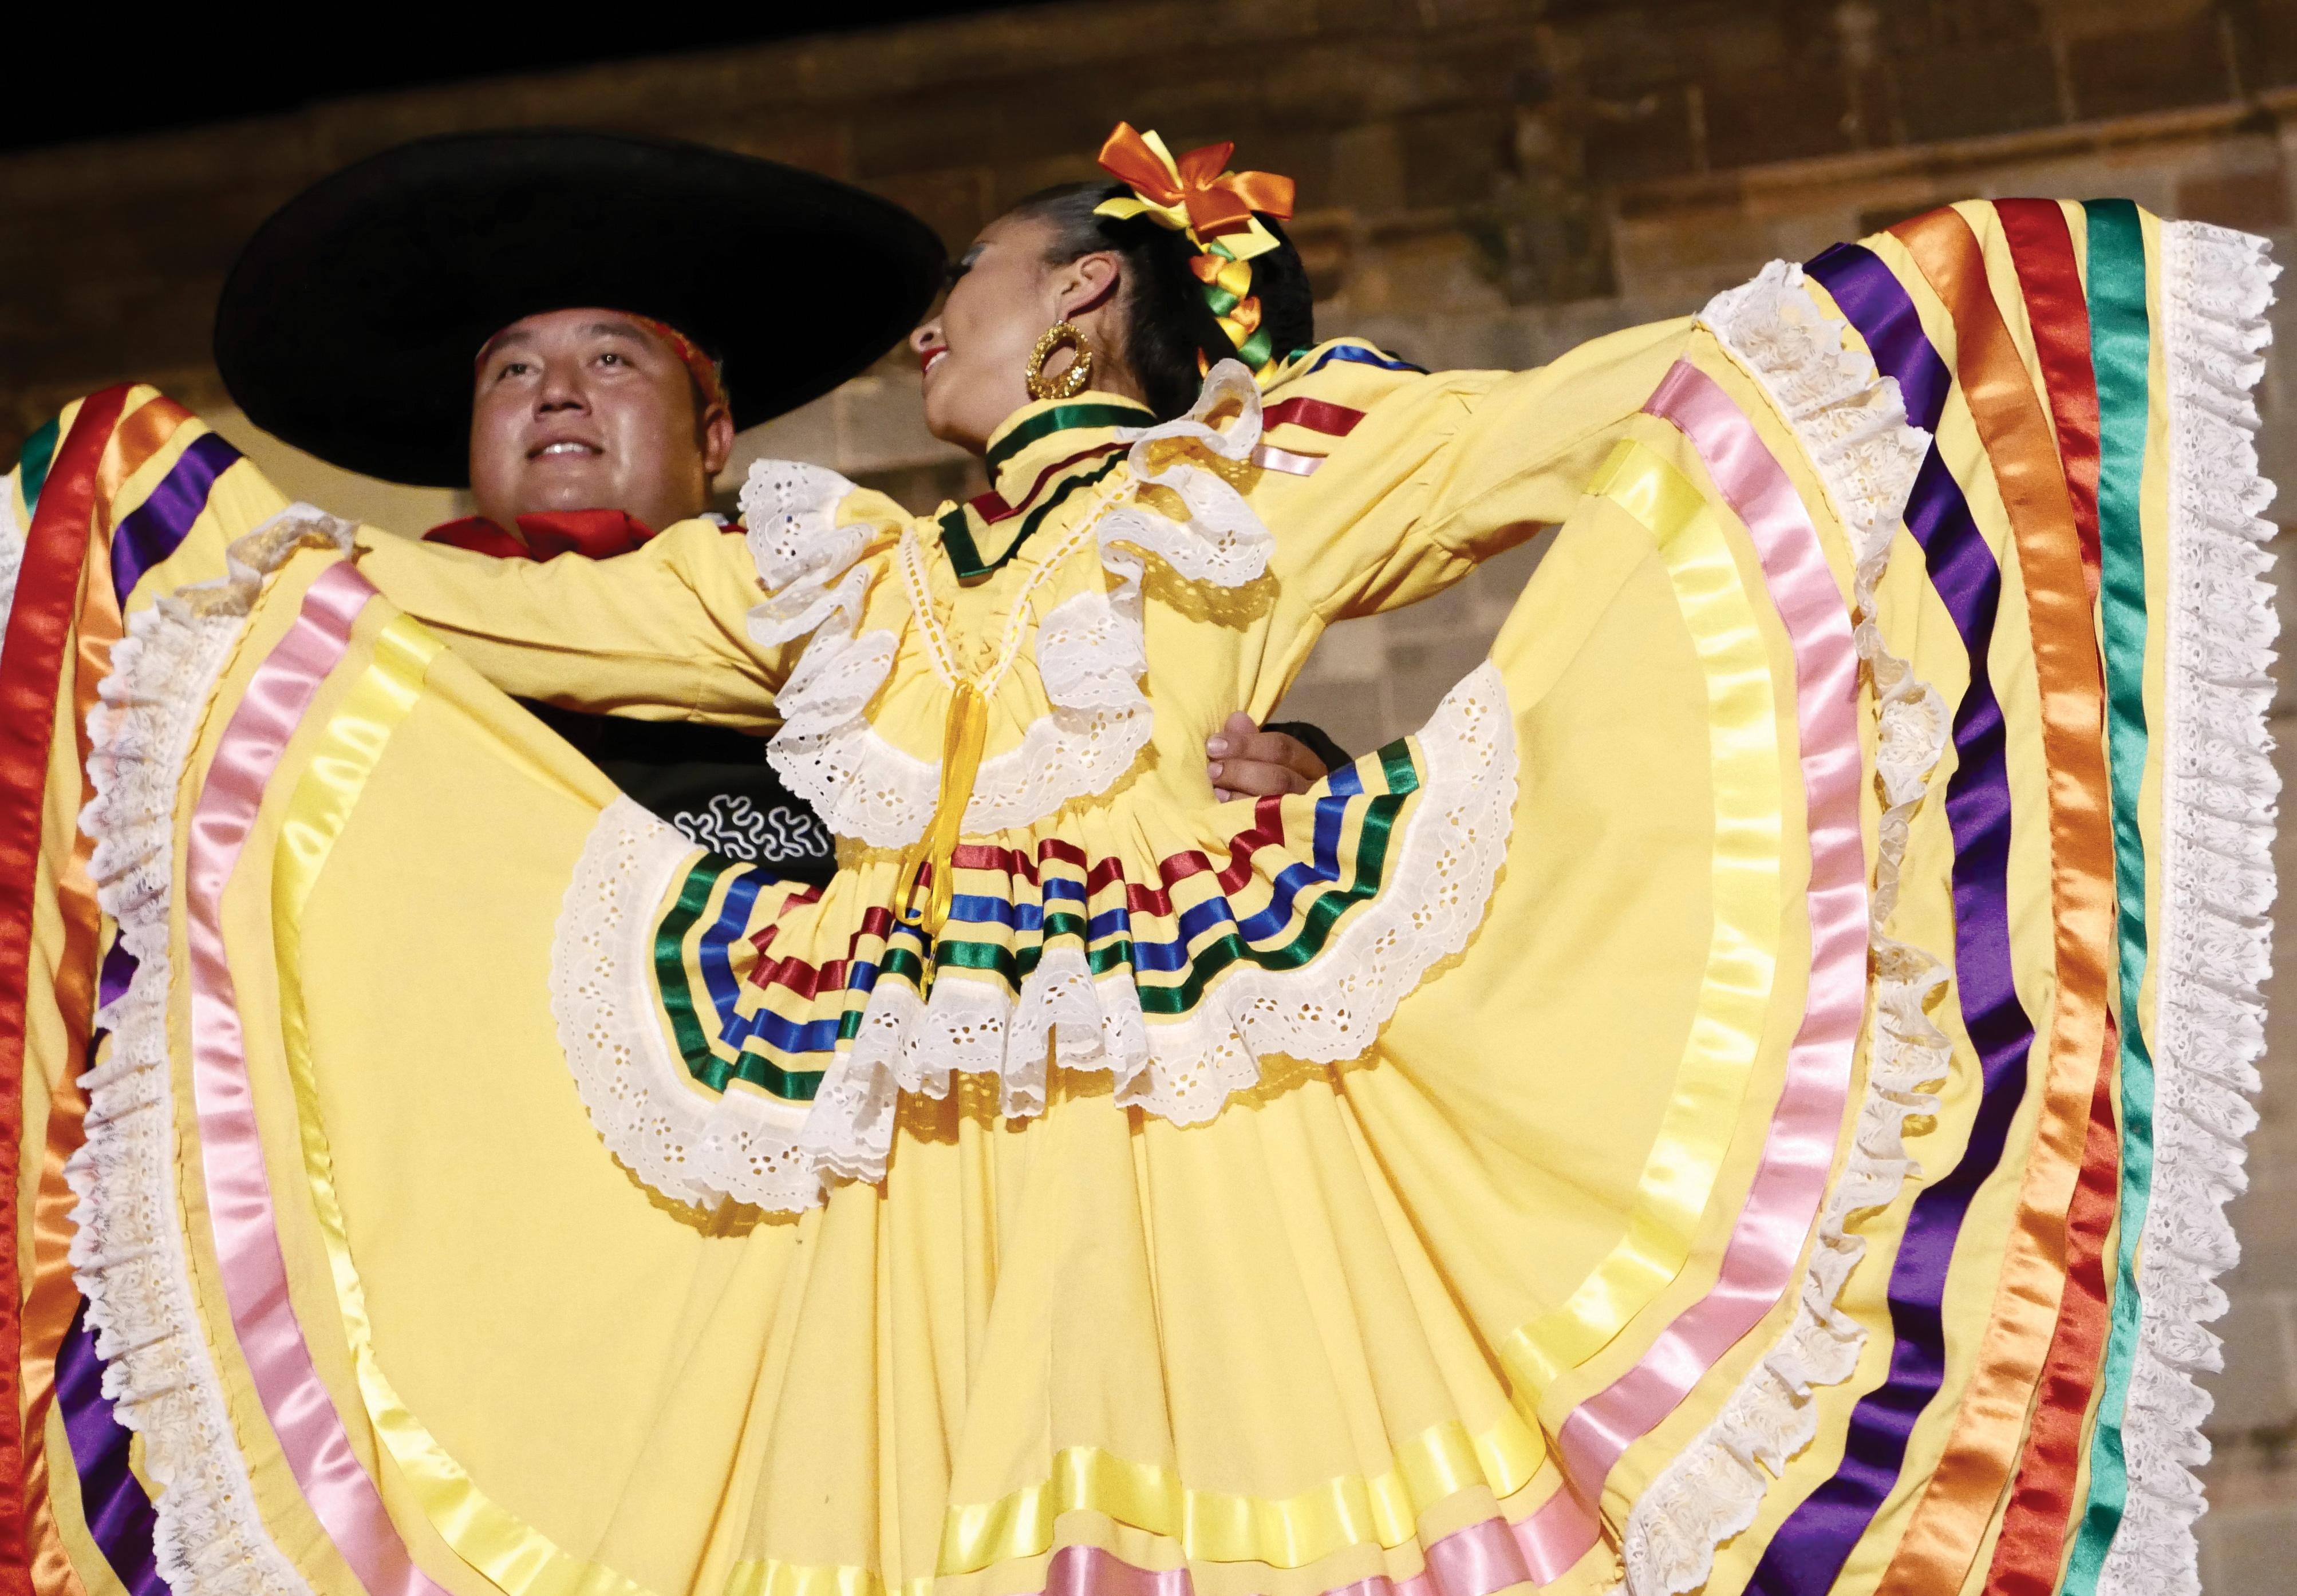 ballet folklorico san miguel de allende teatro juarez travel mexico guanajuato